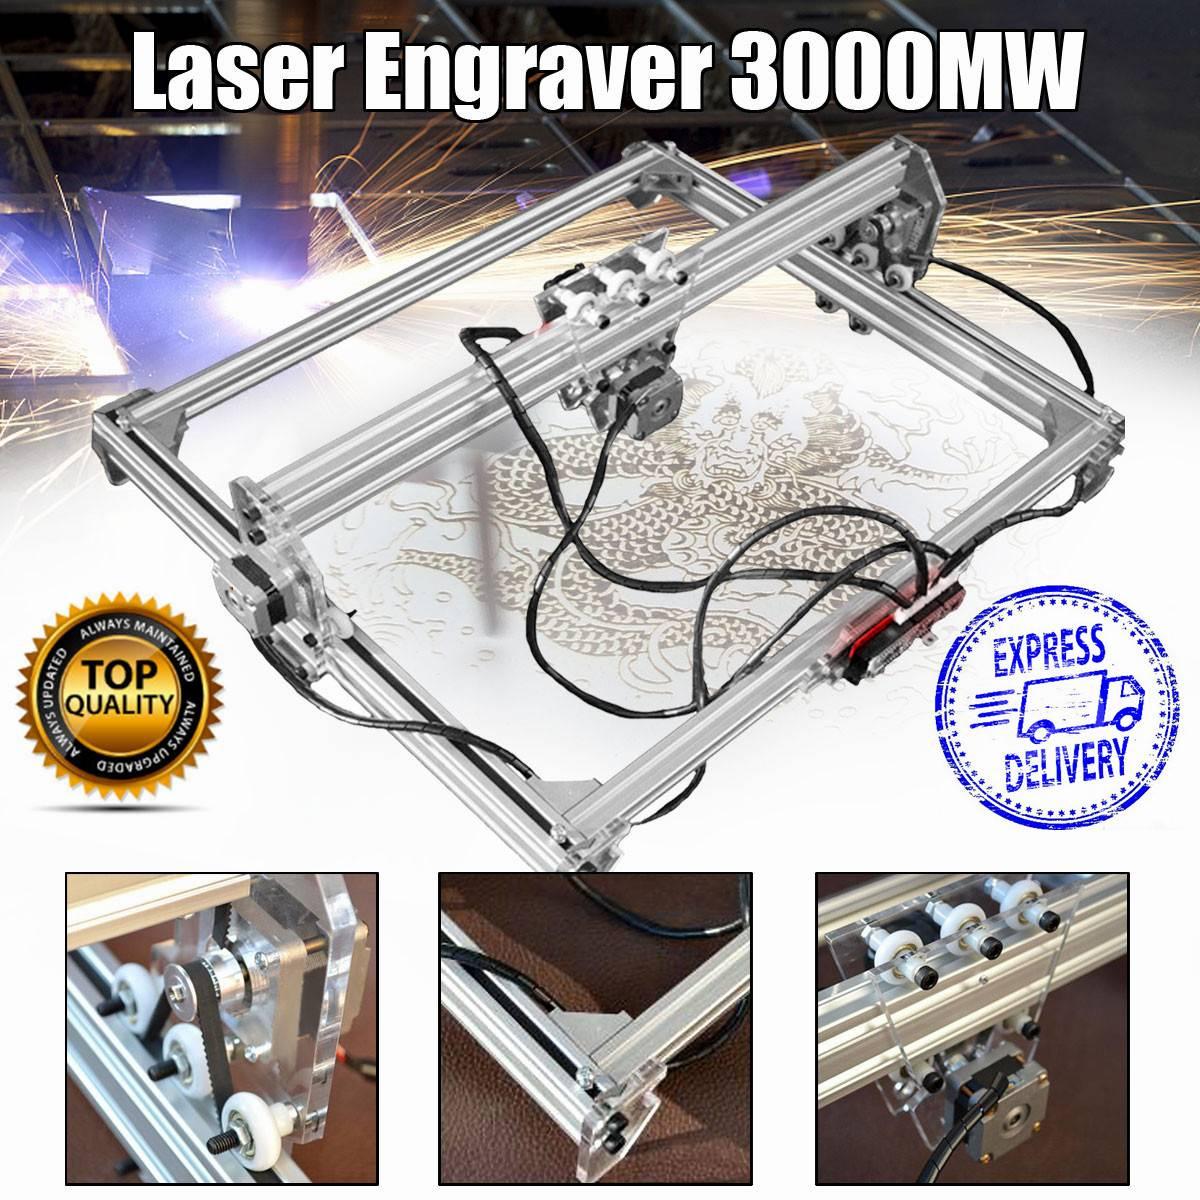 15W /3000mw 50*65cm CNC Laser Engraver Engraving Machine For Metal/Wood Router/DIY Cutter 2Axis Engraver Desktop Cutter+ Laser